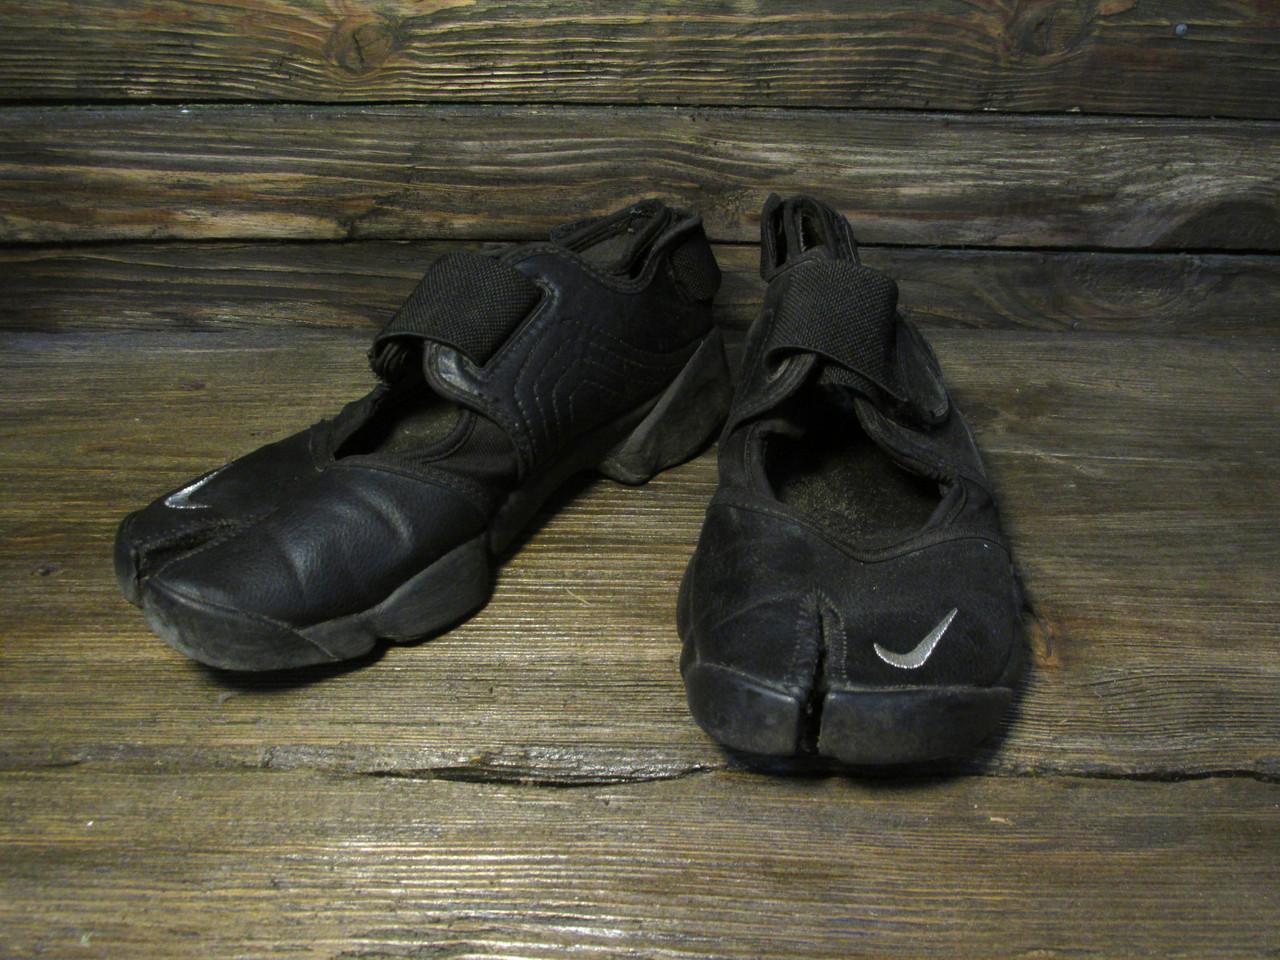 Кроссовки Nike 38 (24.5 см), Indonesia, кожа, Оч хор сост!